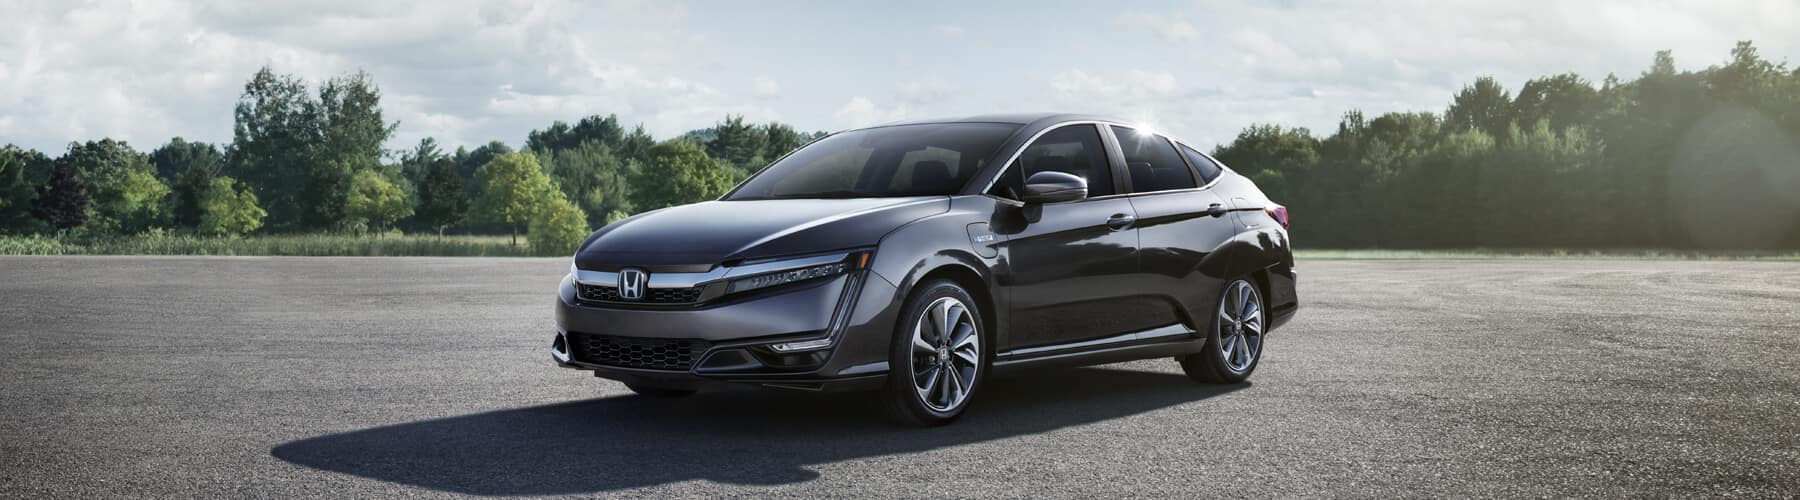 2018 Honda Clarity Plug-In Hybrid Slider